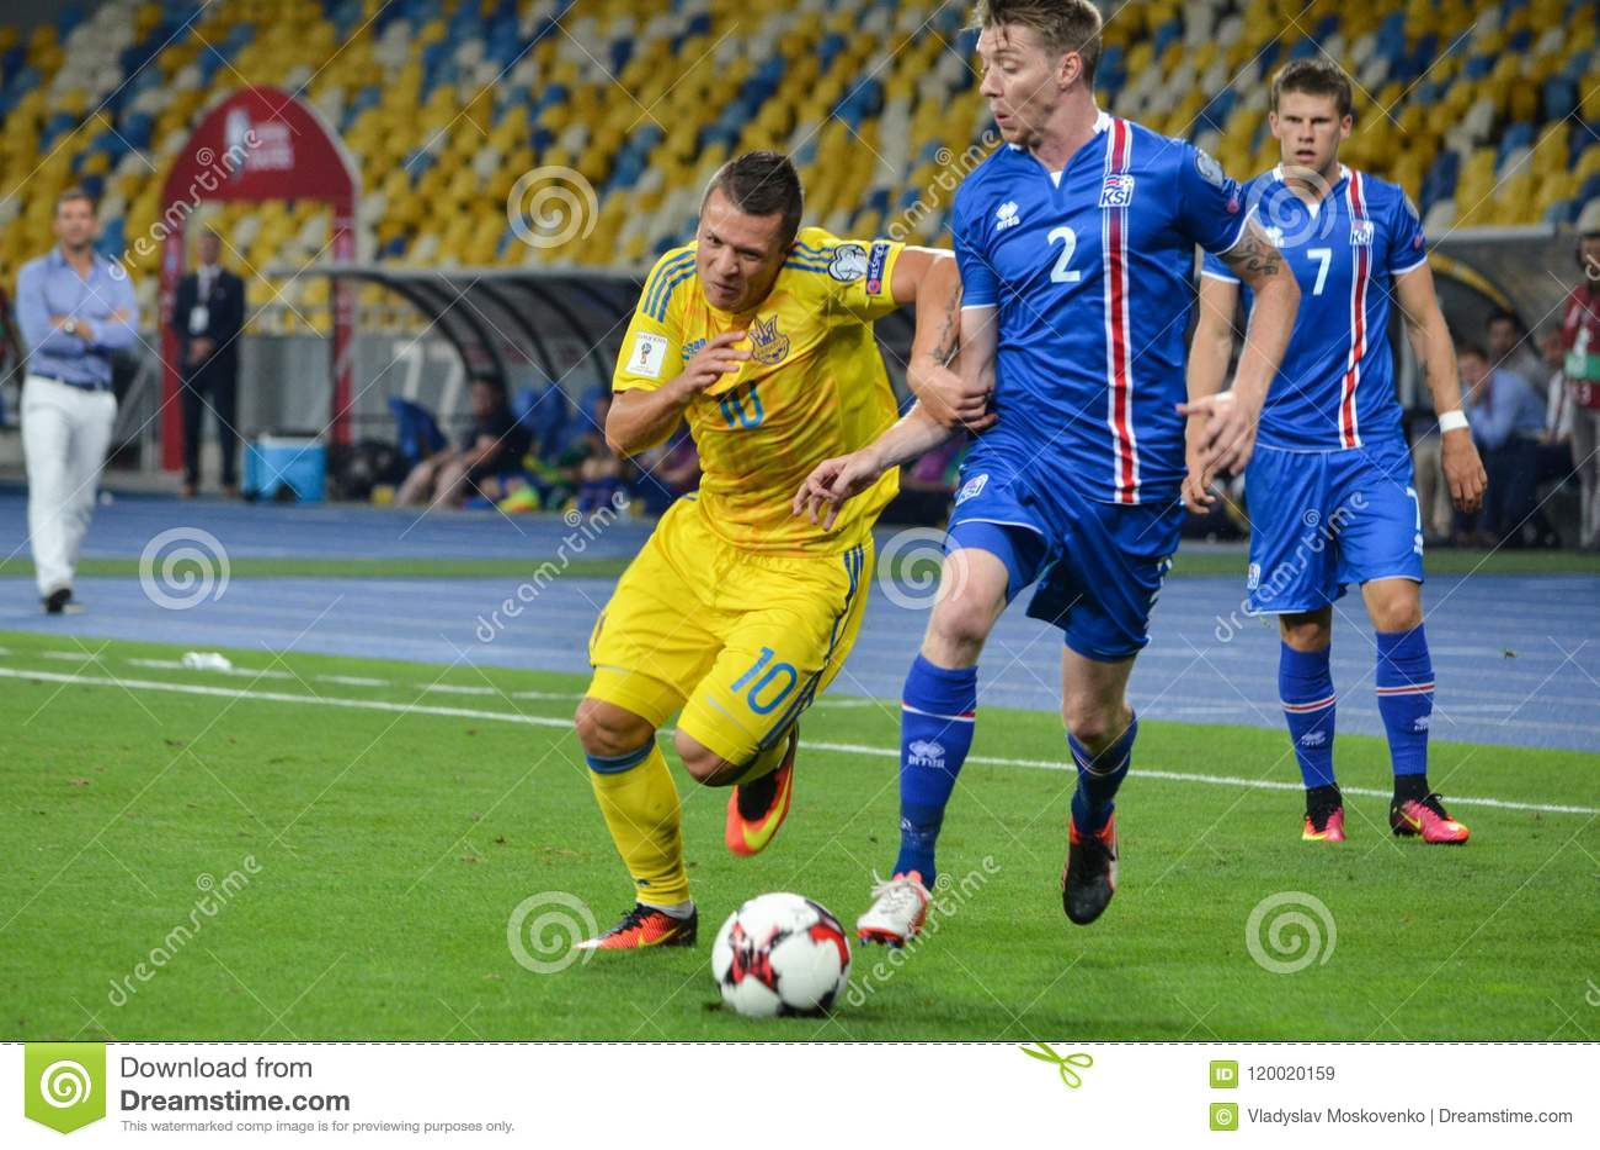 KYIV, UKRAINE - SEPT 5, 2016: Evgeniy Konoplyanka against Birkir Mar Saevarsson (R) during the FIFA World Cup 2018 qualifying